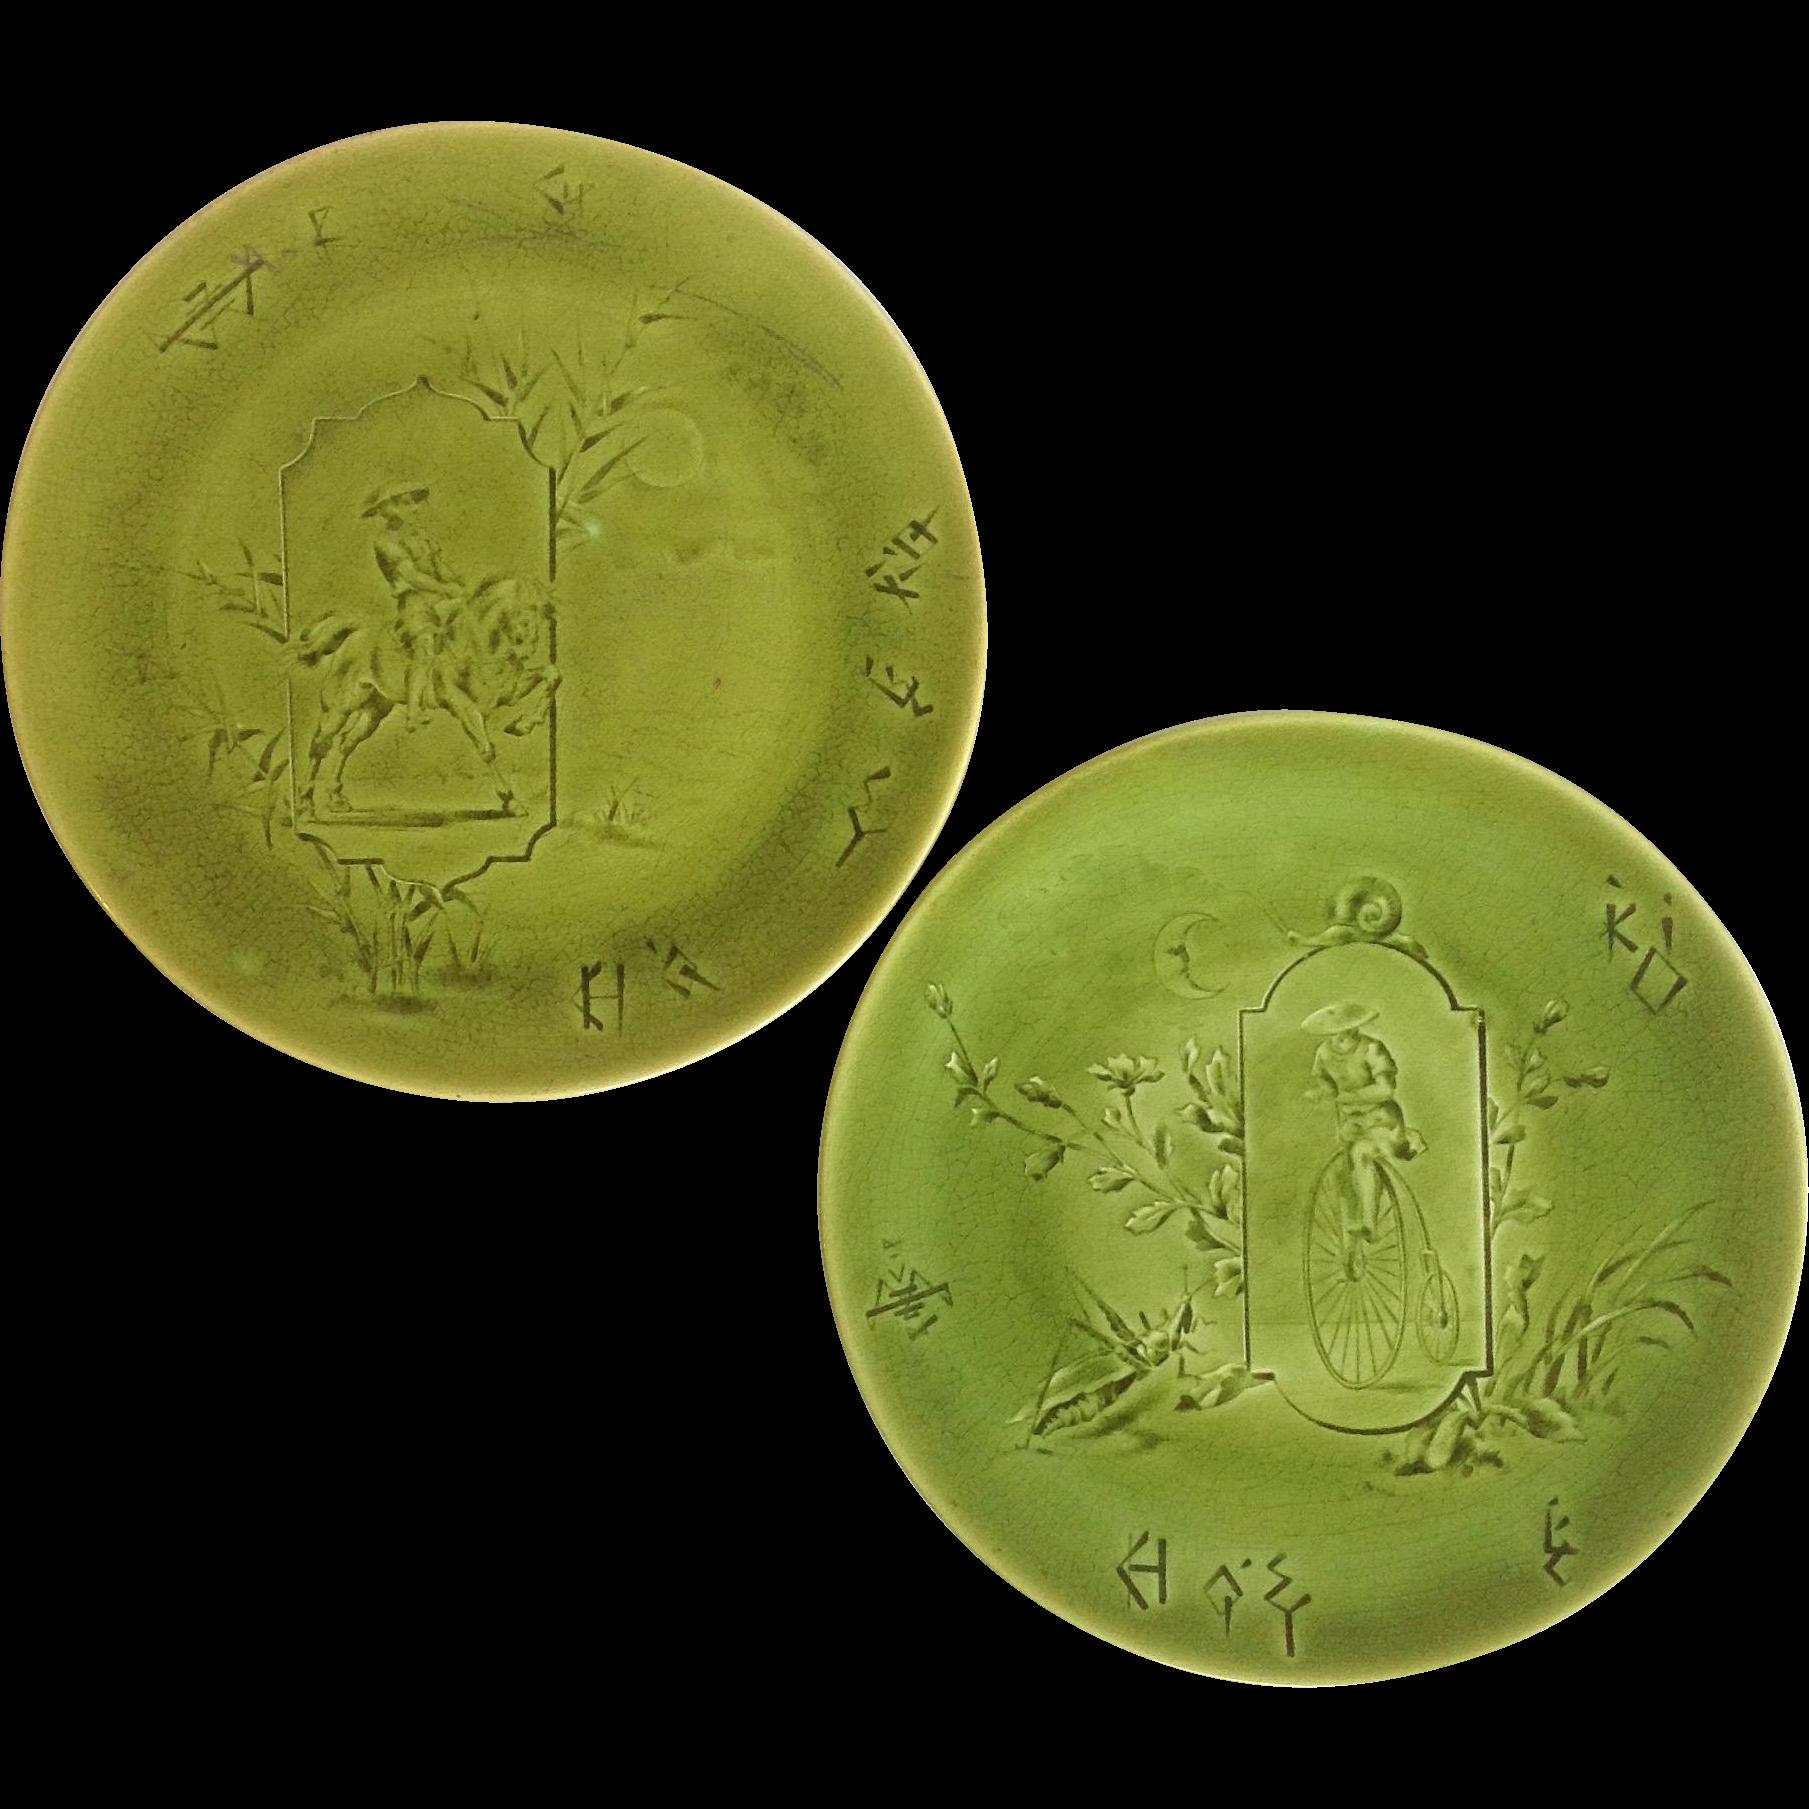 Pair of Majolica Green Glazed Choisy-le-Roi Plates from antiquesofriveroaks on Ruby Lane